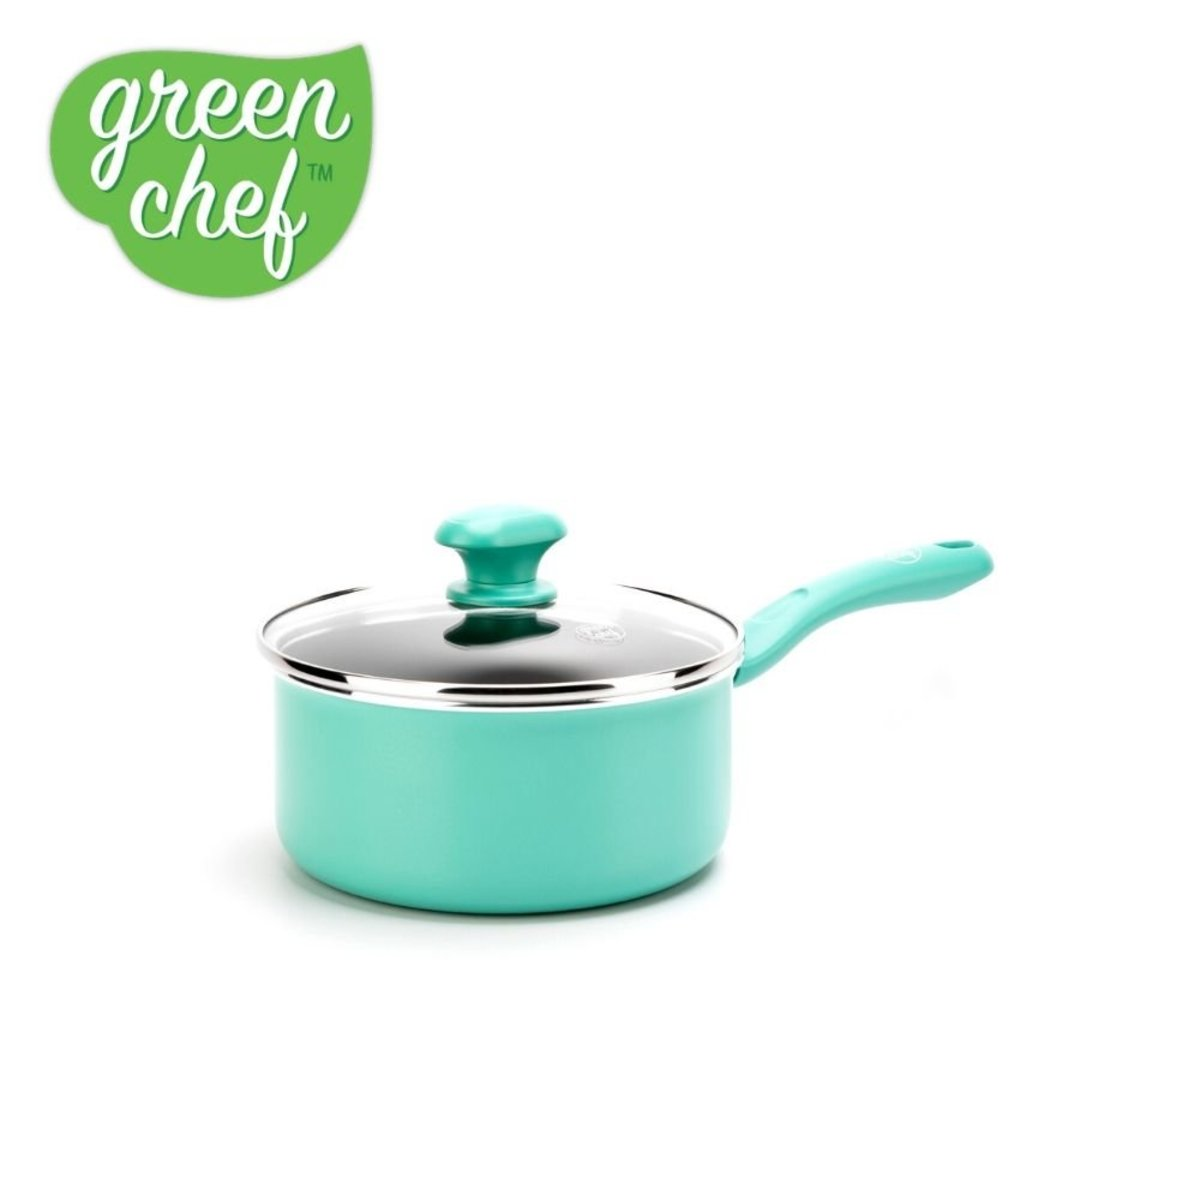 18cm 奶鍋 (配玻璃蓋) CC002372